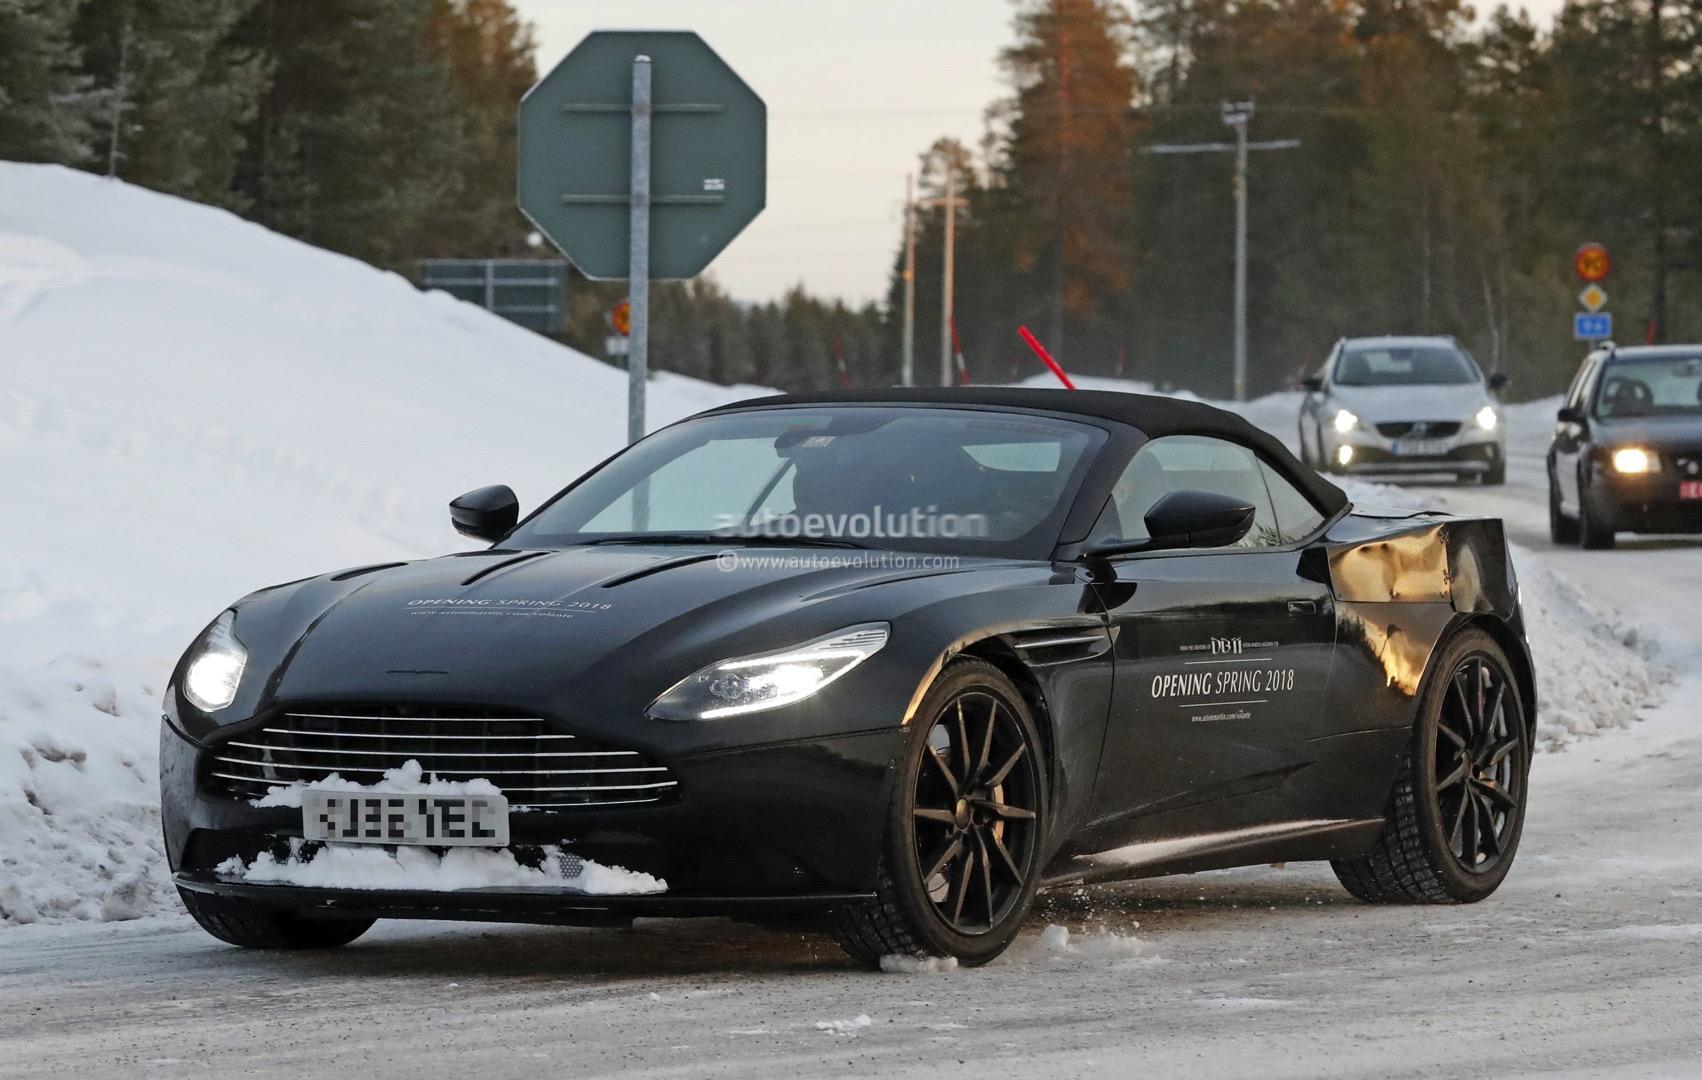 2018 Aston Martin Db11 Volante Spied Shows Modified Aeroblade Intakes Autoevolution